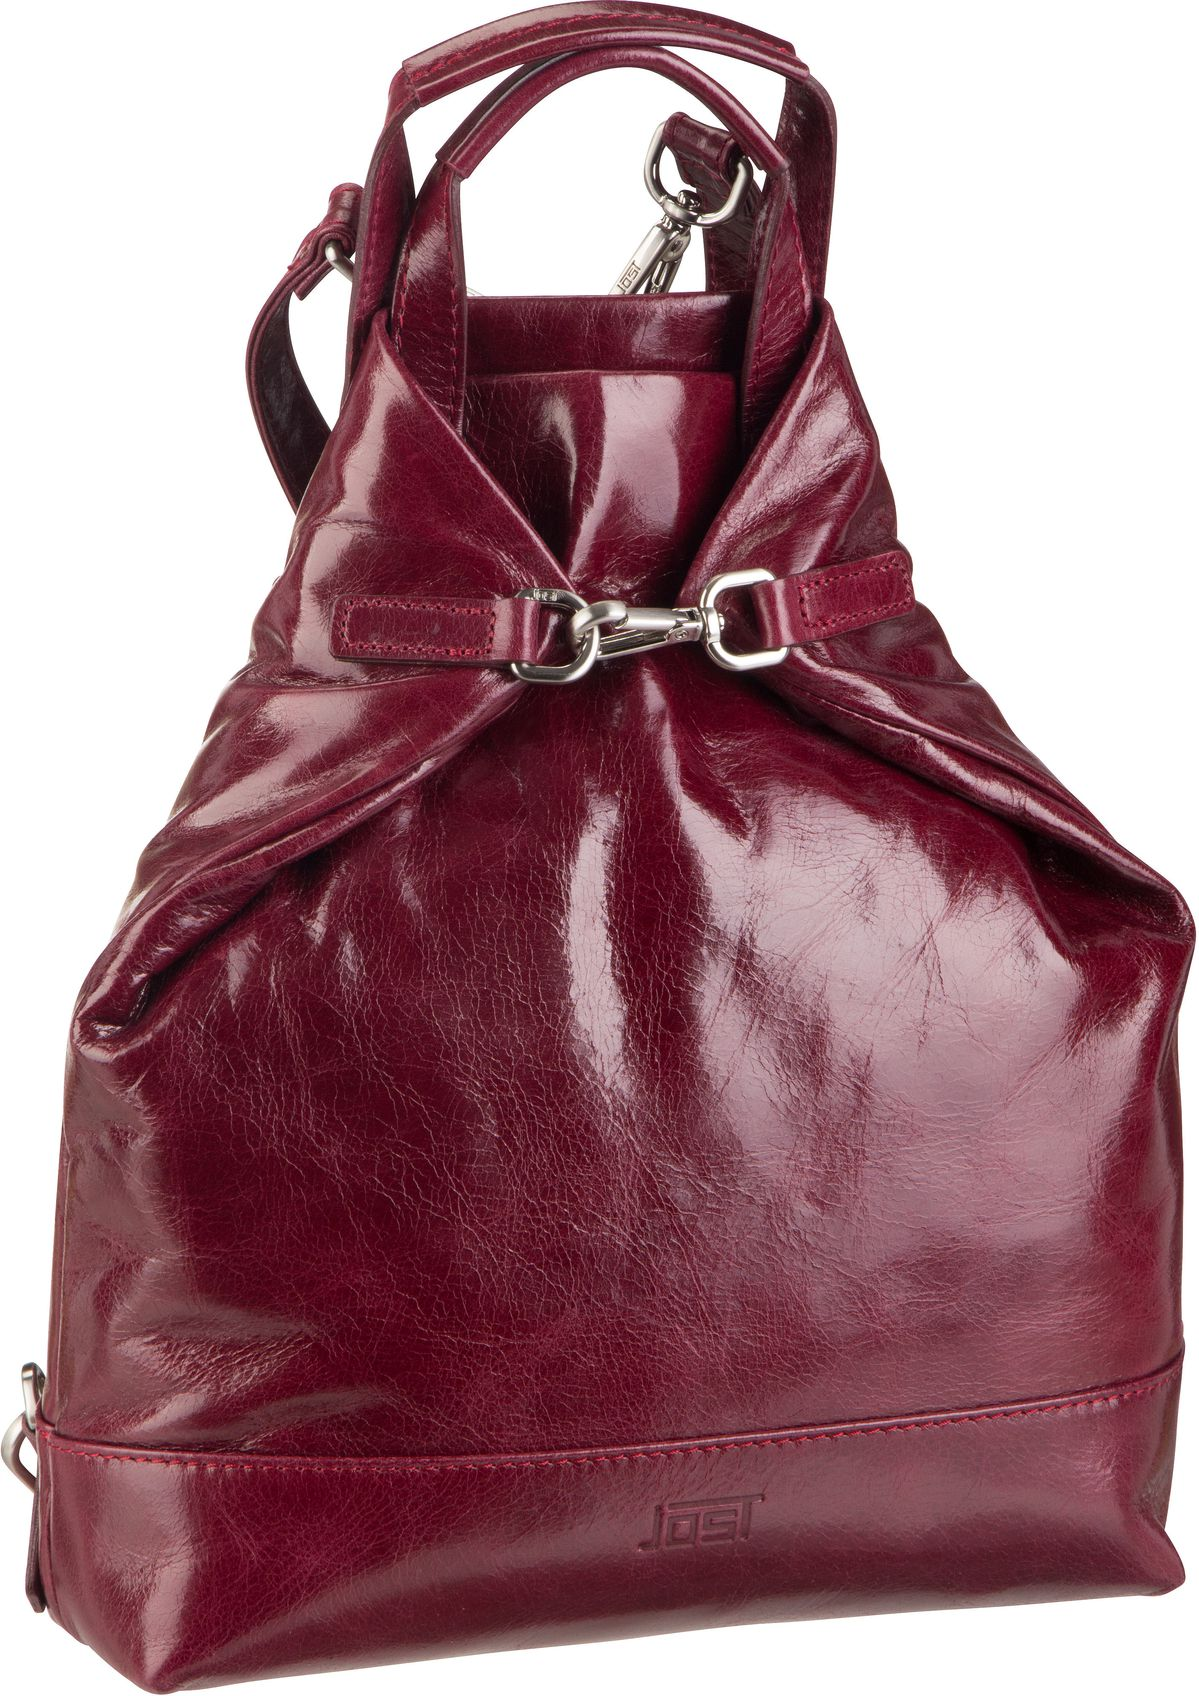 Rucksack / Daypack Boda 6624 X-Change Bag XS Bordeaux